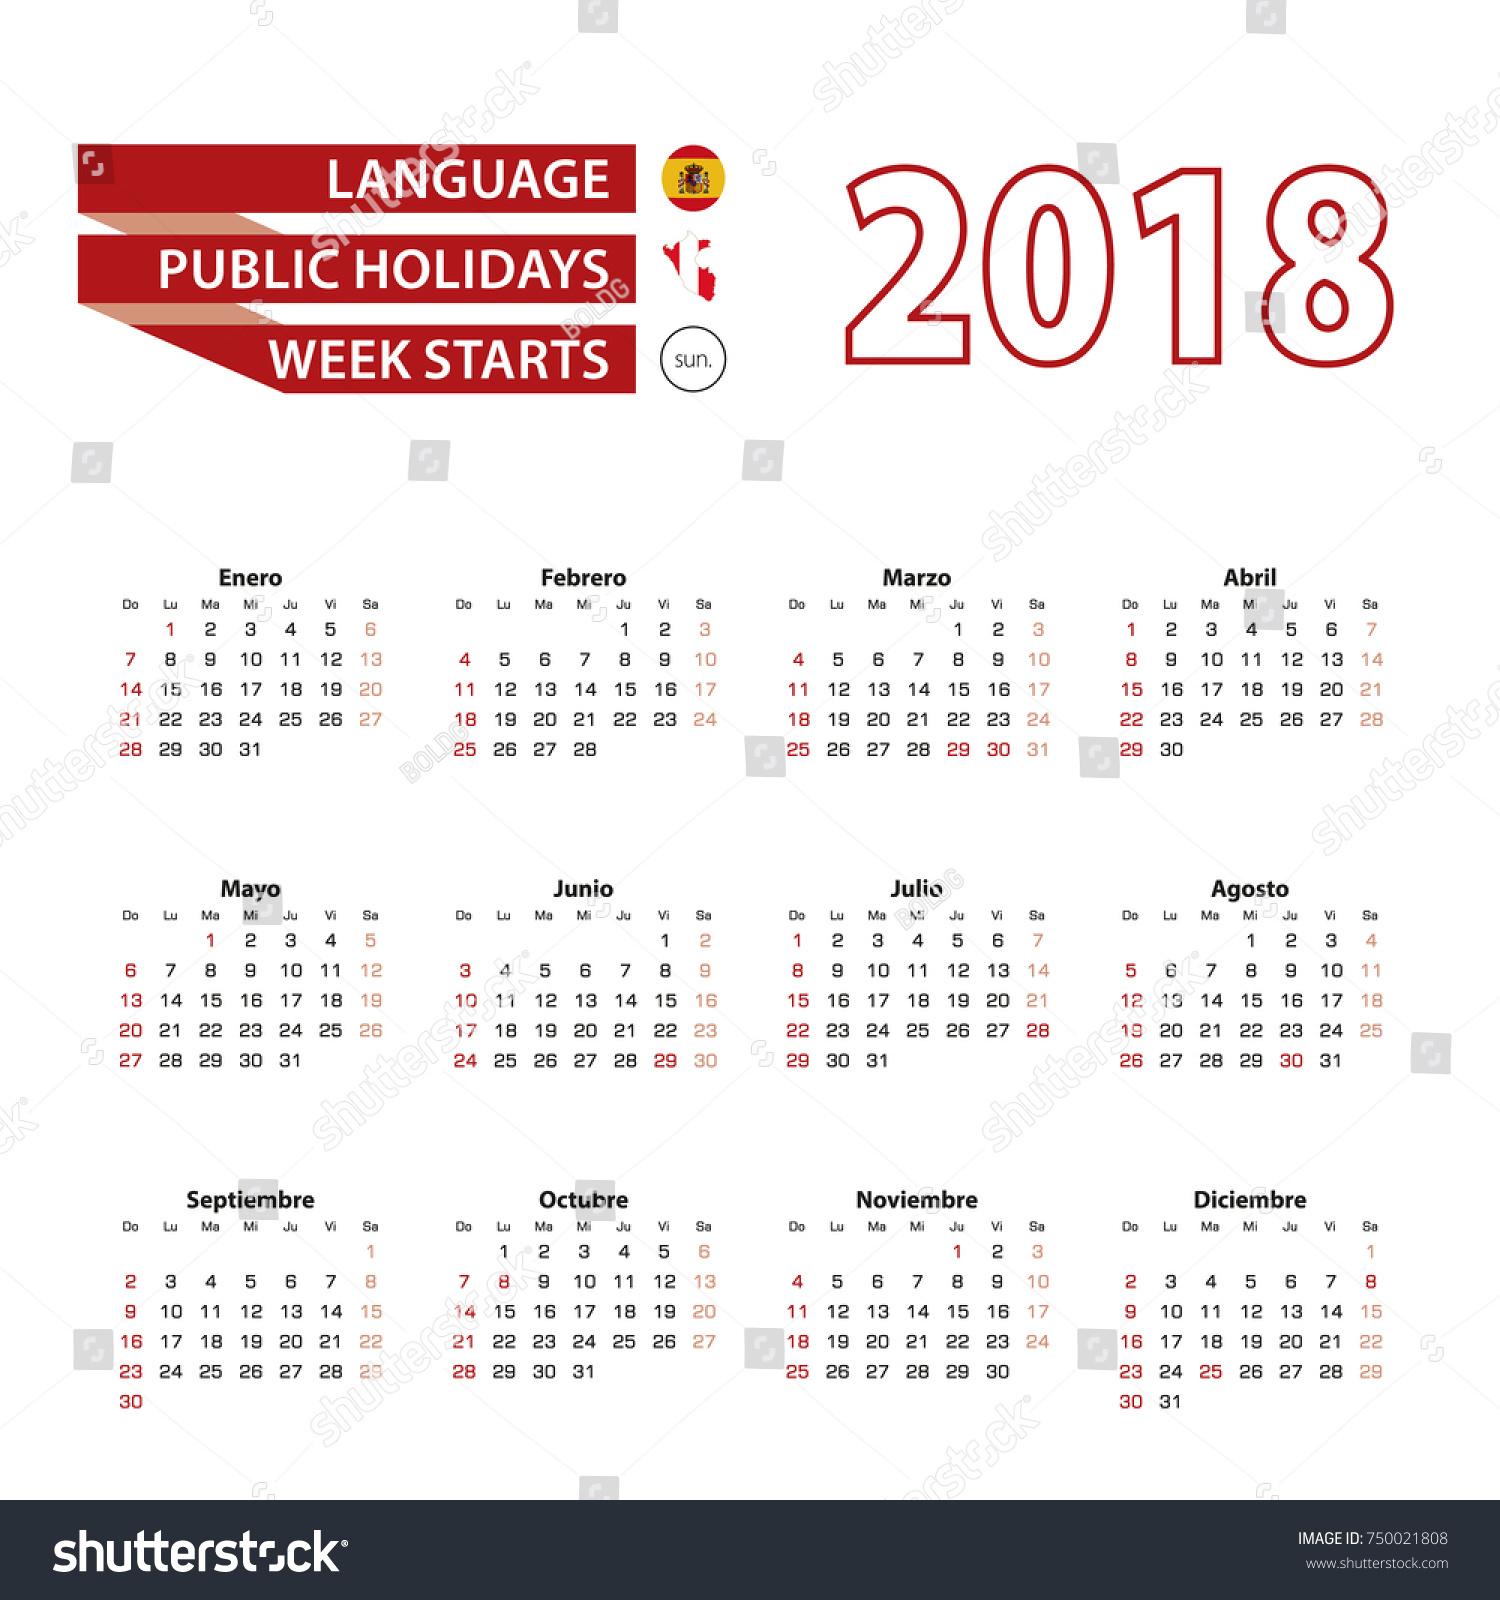 Weekly Calendar In Spanish : Calendar spanish language public holidays stock